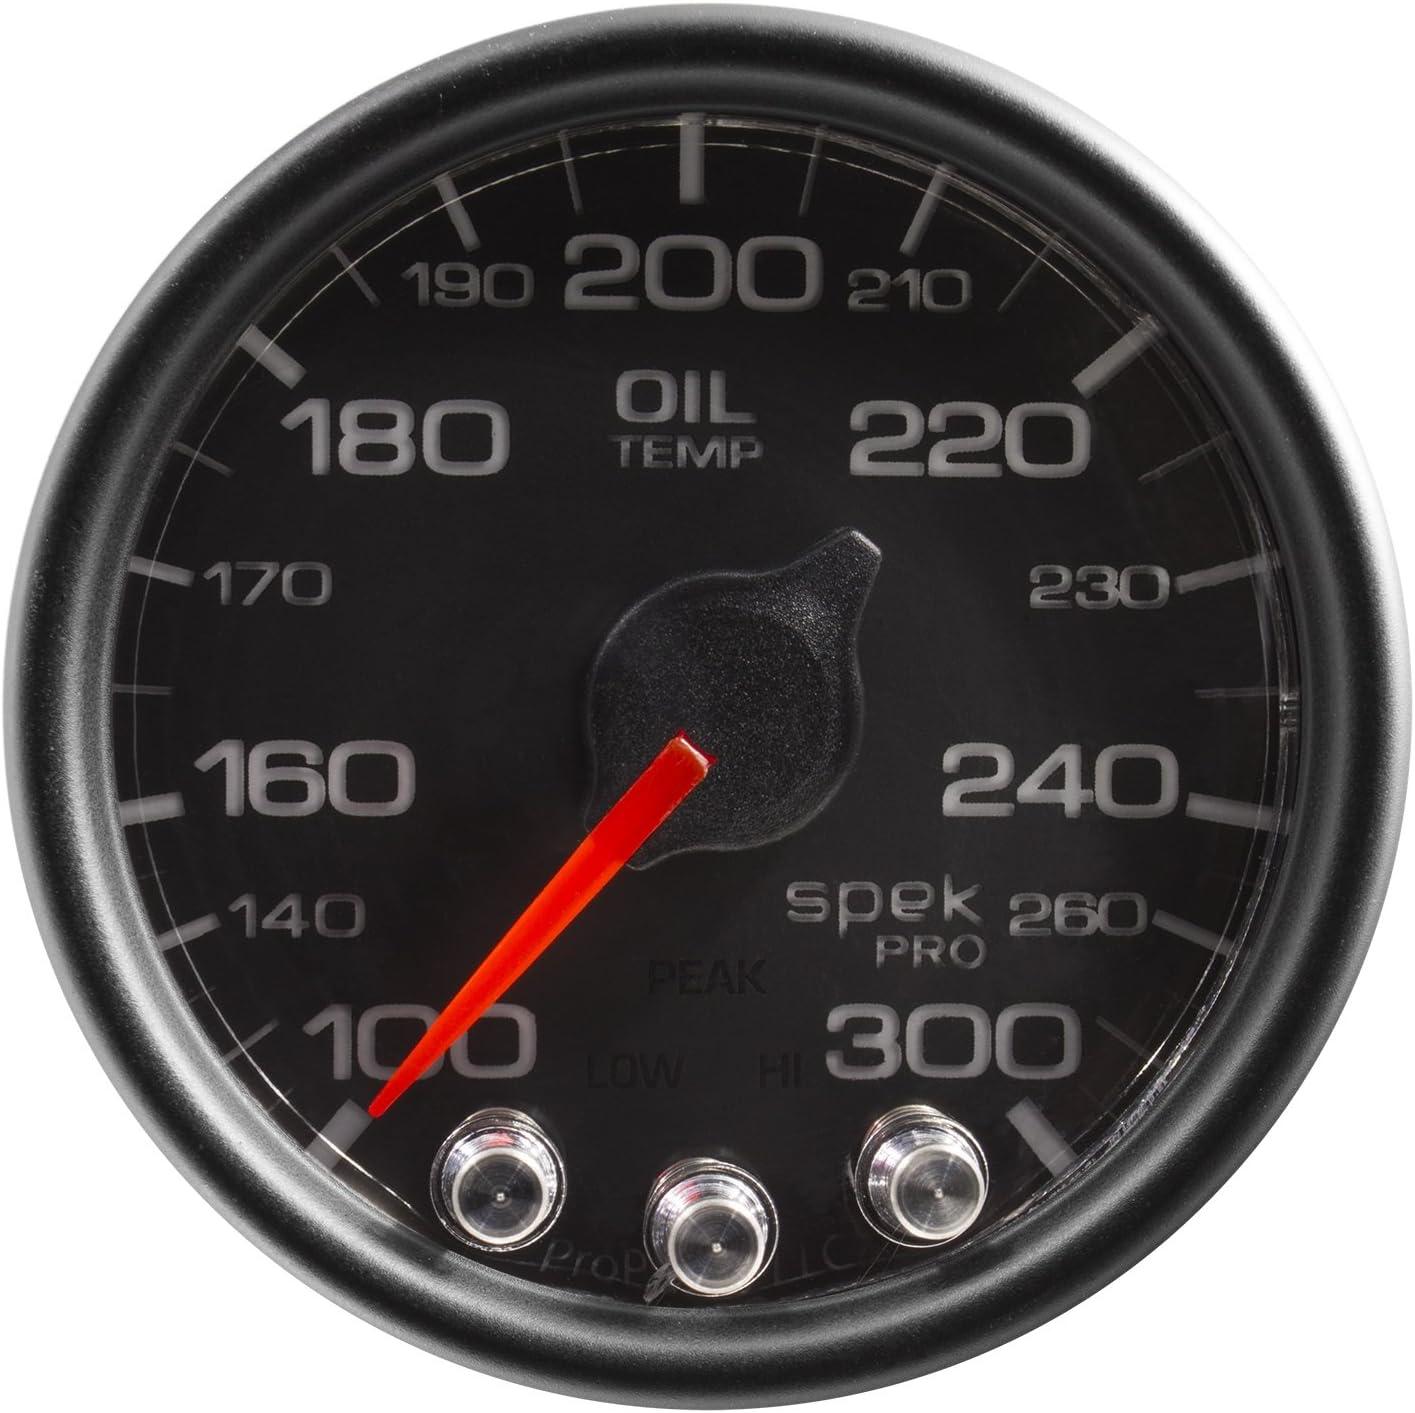 300/ºf Blk//Chrm AUTO METER P322318 Gauge Stepper Motor W//Peak /& Warn Oil Temp 2 1//16 Spek-Pro